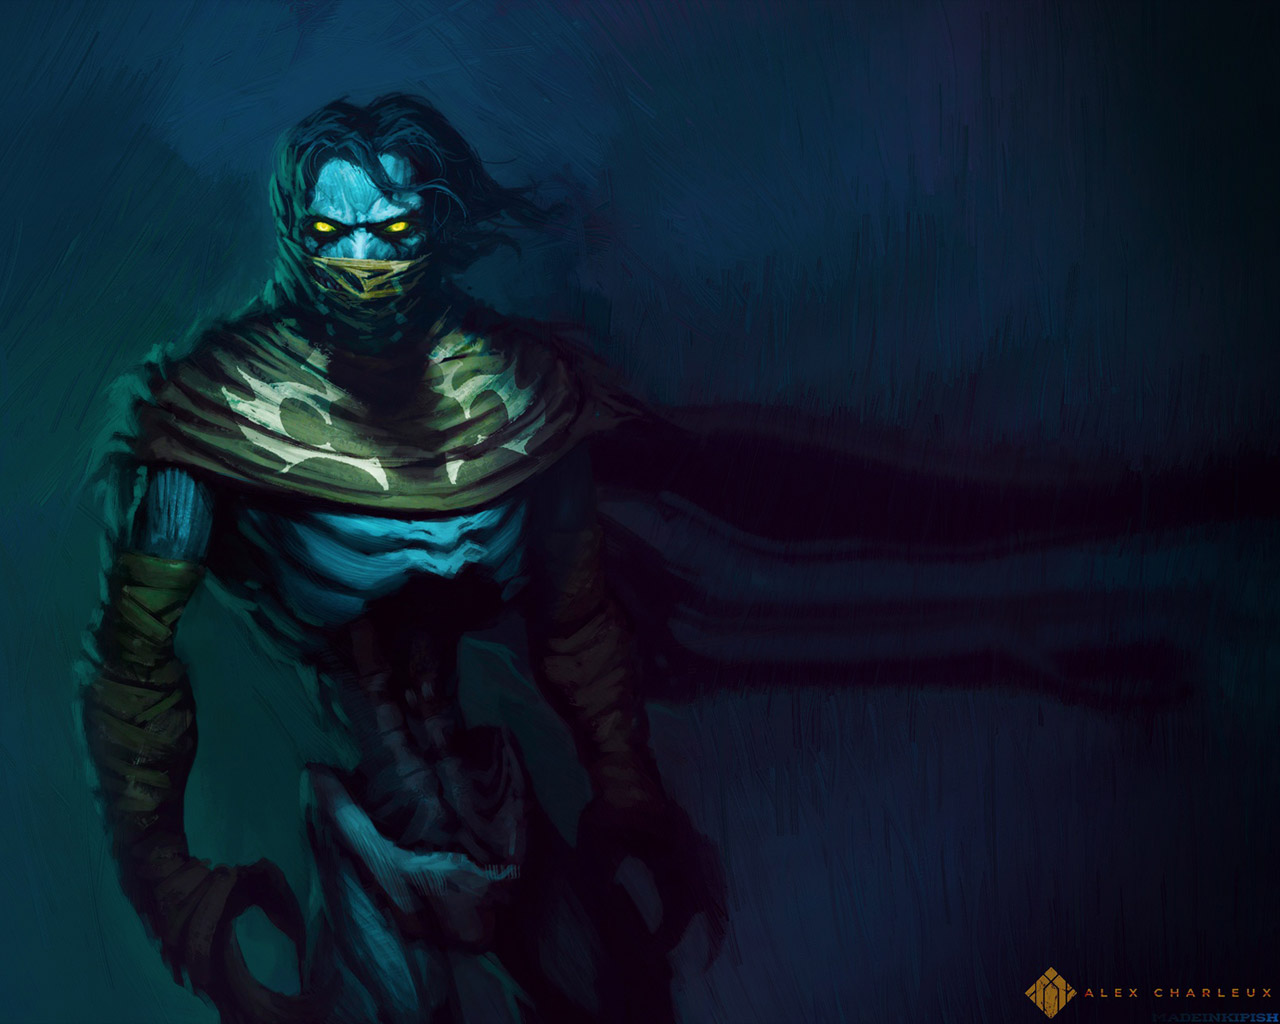 Free Legacy of Kain: Soul Reaver Wallpaper in 1280x1024